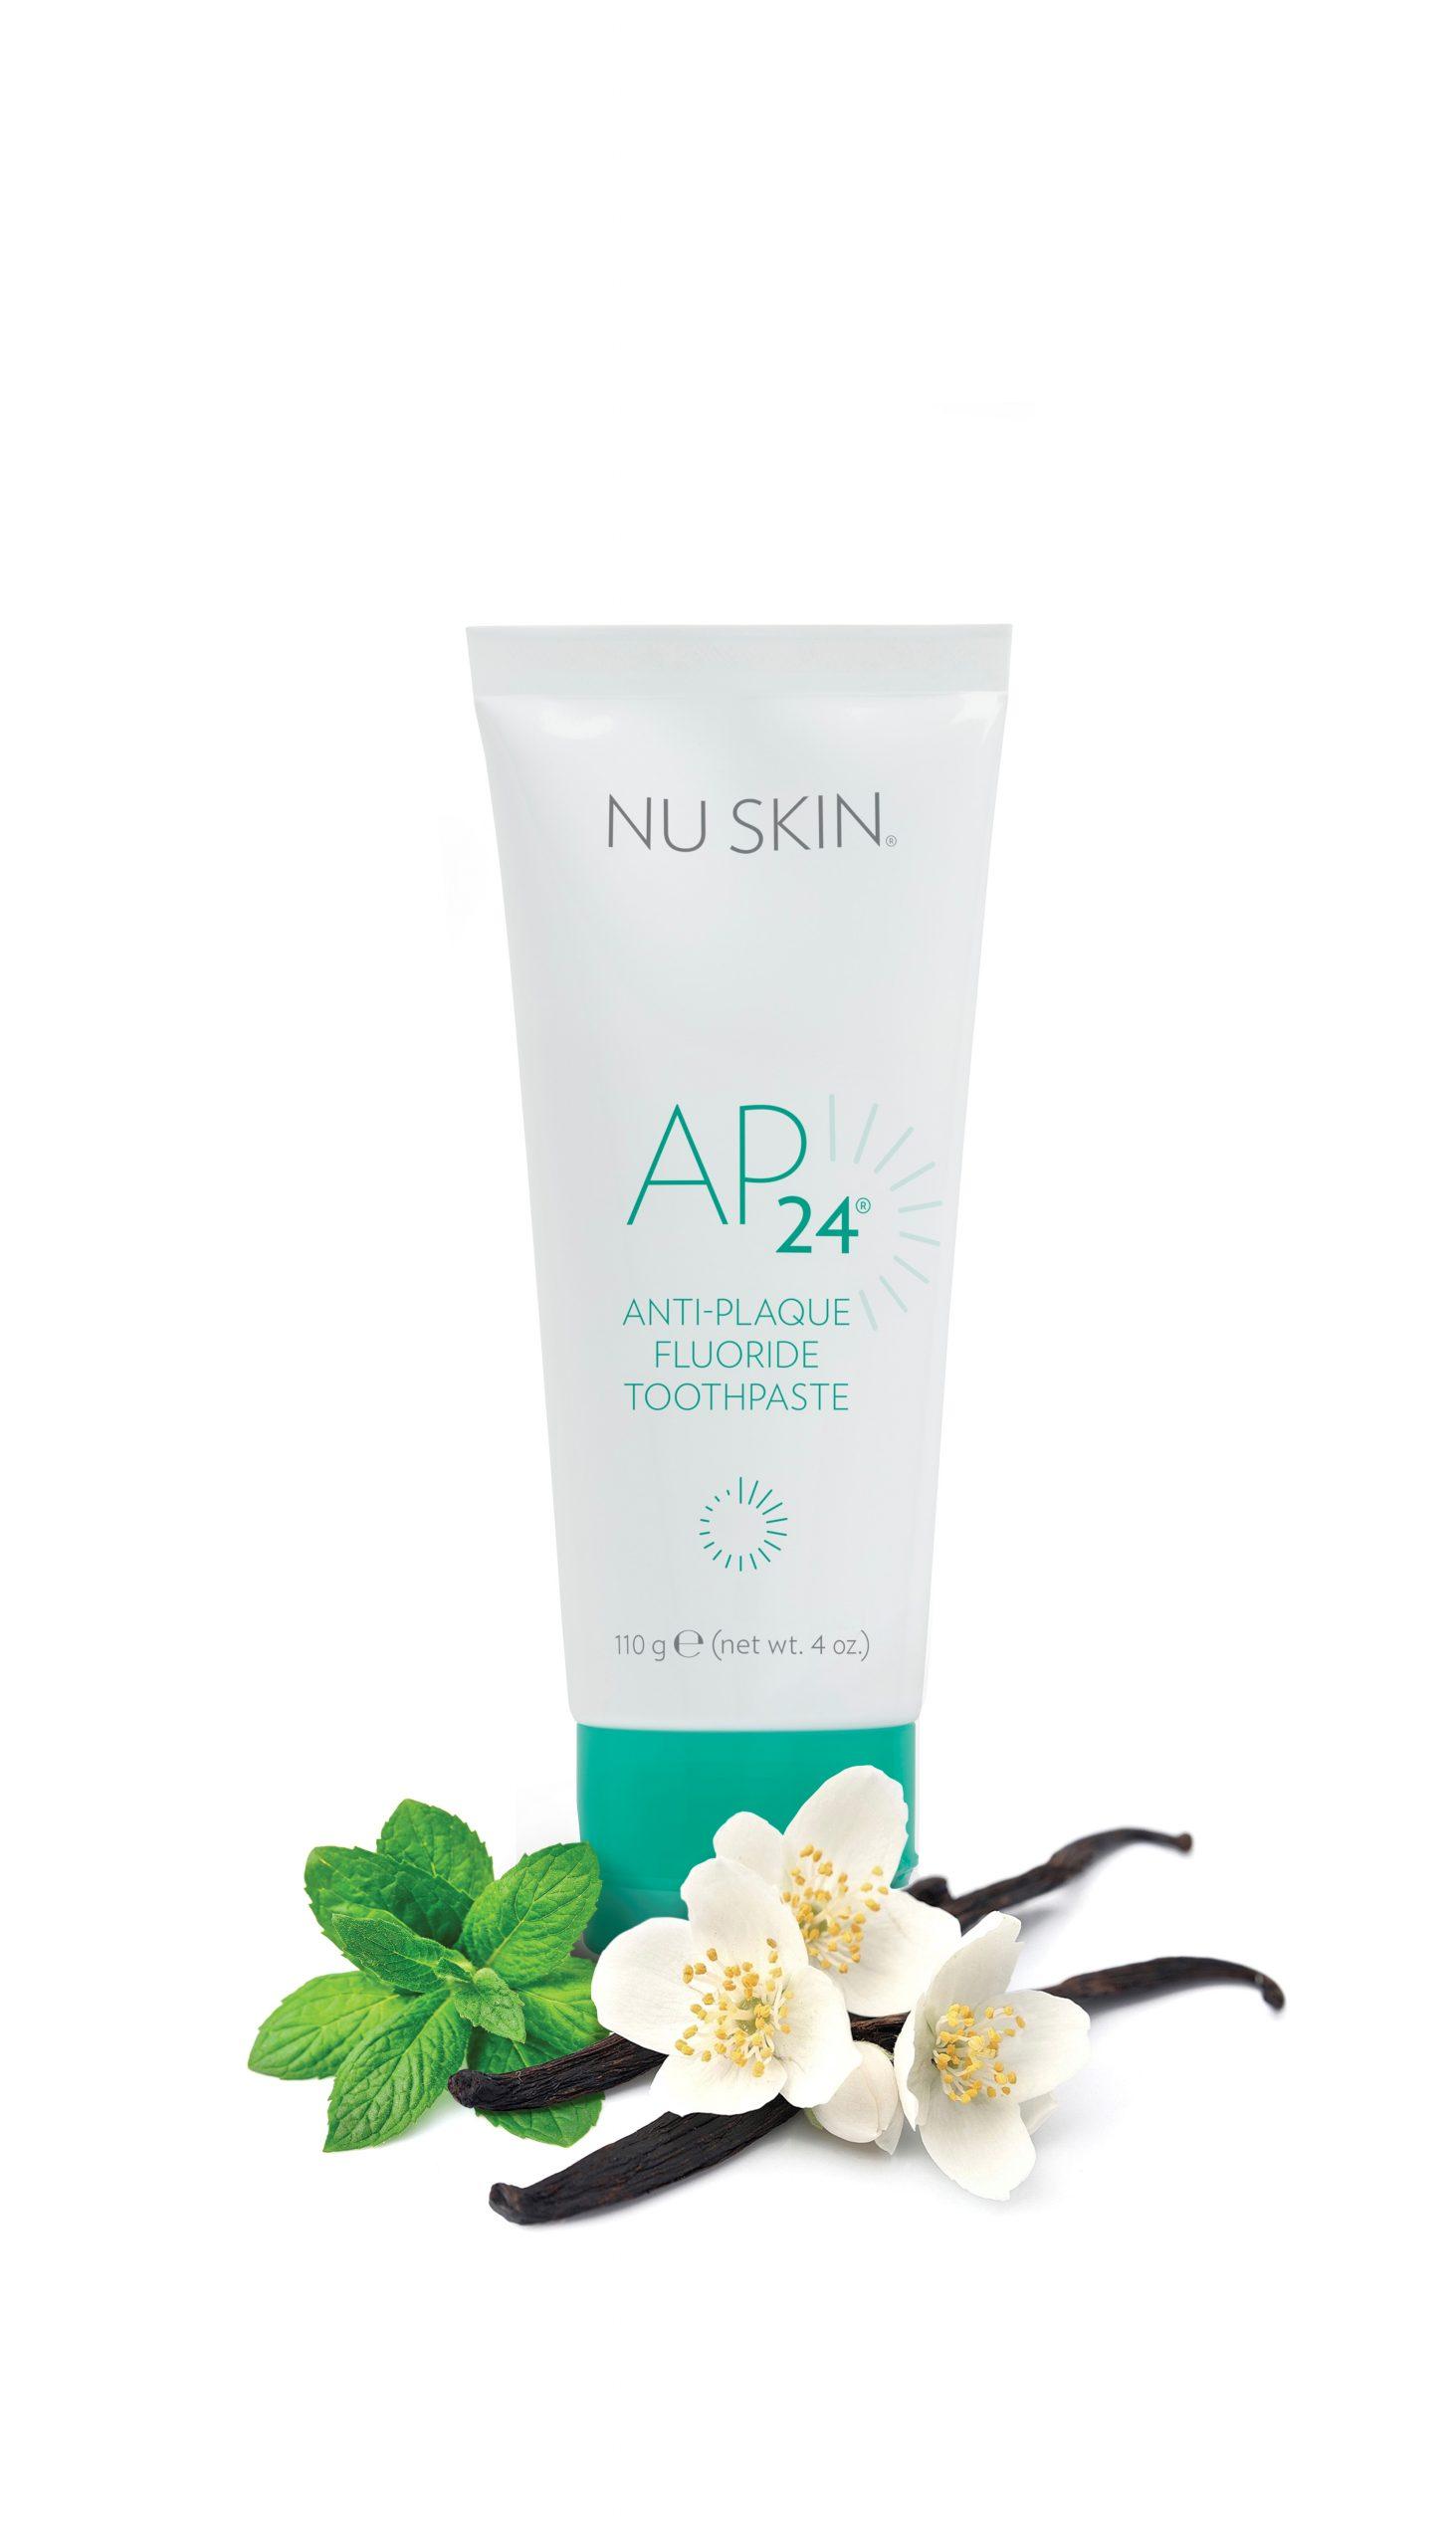 AP 24 Anti-Plaque Fluoride Toothpaste (fogkő elleni fluoridos fogkrém) fotók